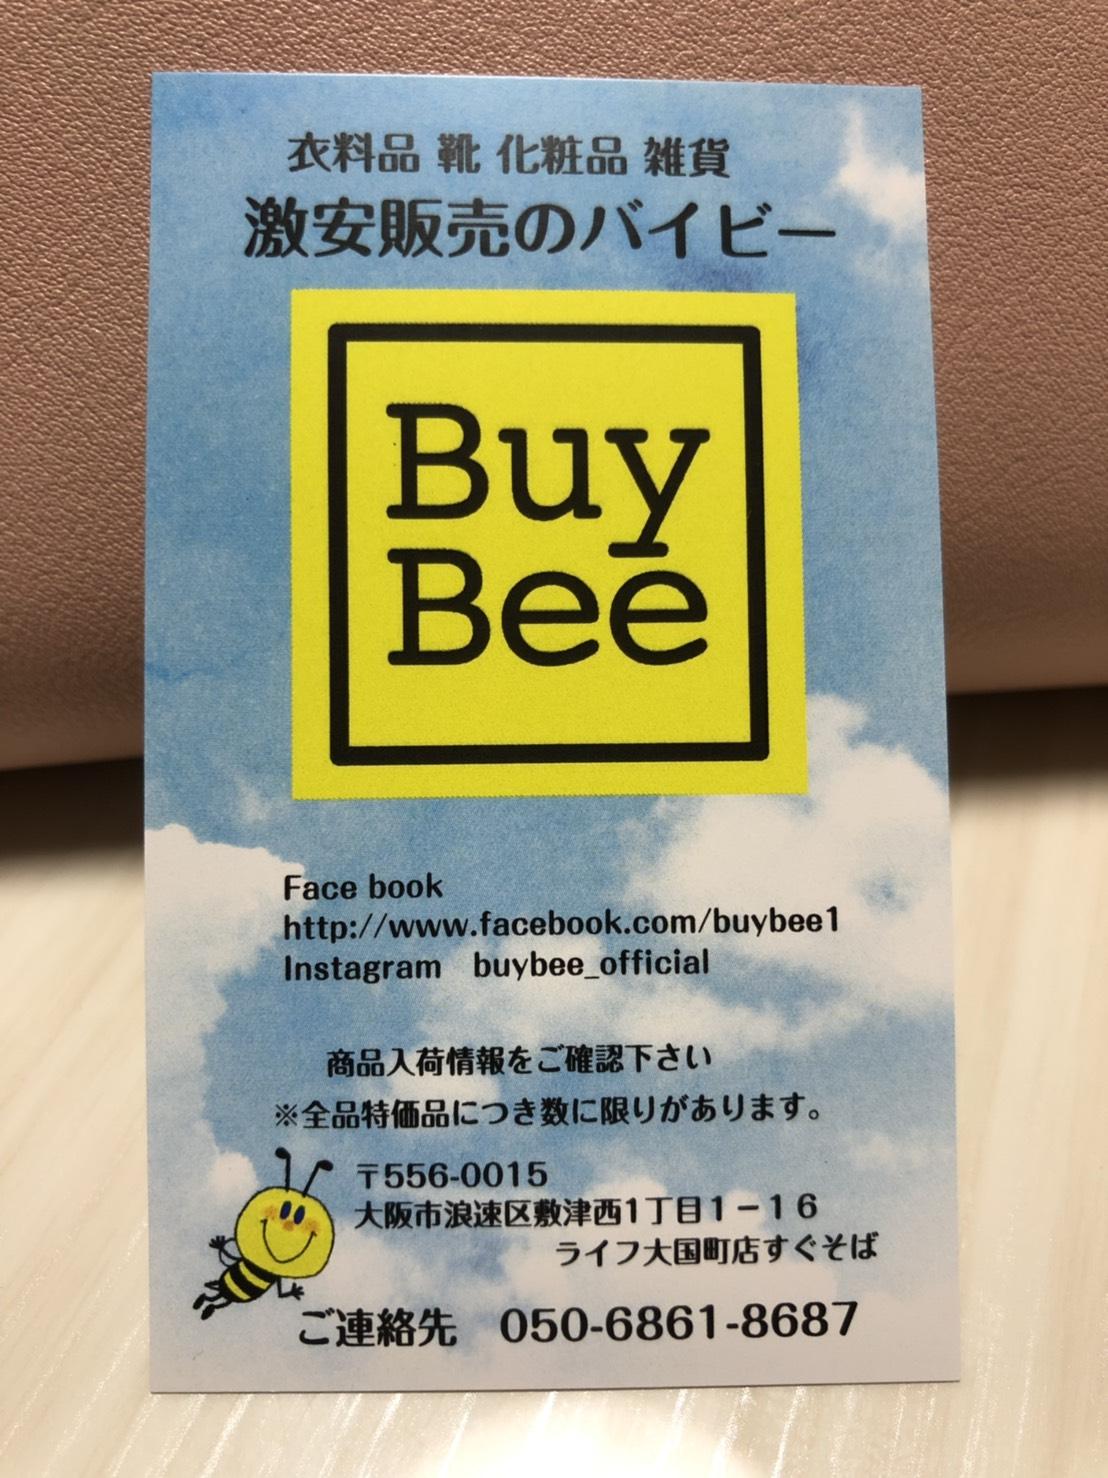 Buy Bee  洋服 雑貨 コスメ 激安店